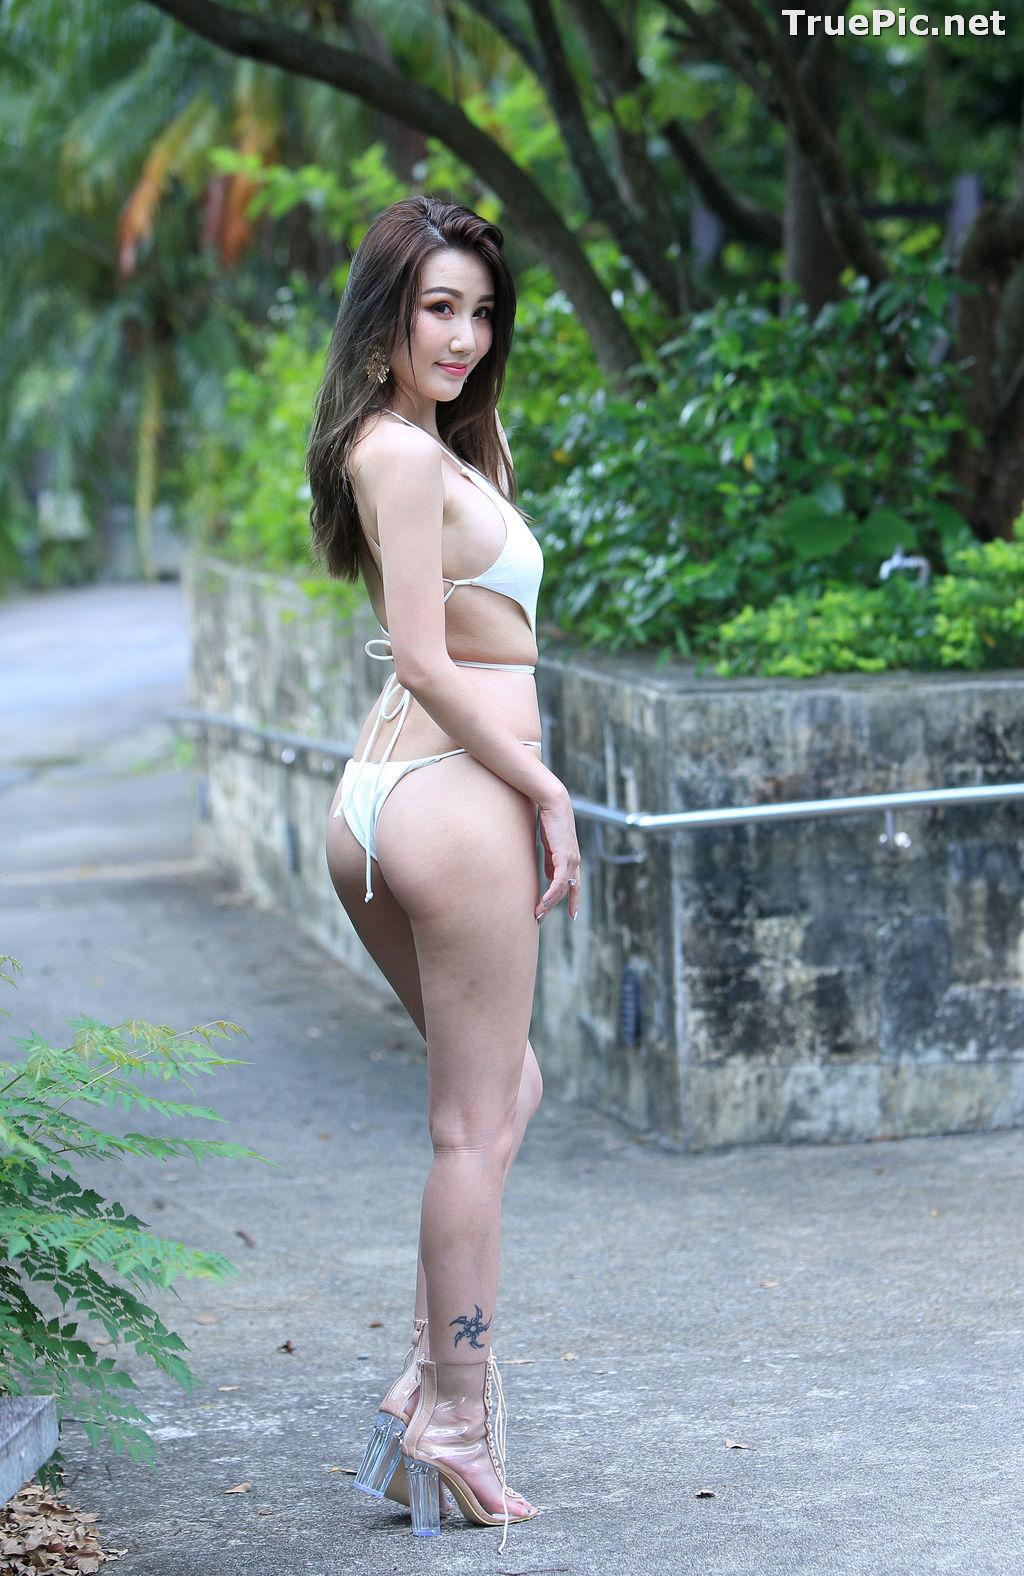 Image Taiwanese Beautiful Model - Suki - White Sexy Bikini Girl - TruePic.net - Picture-4